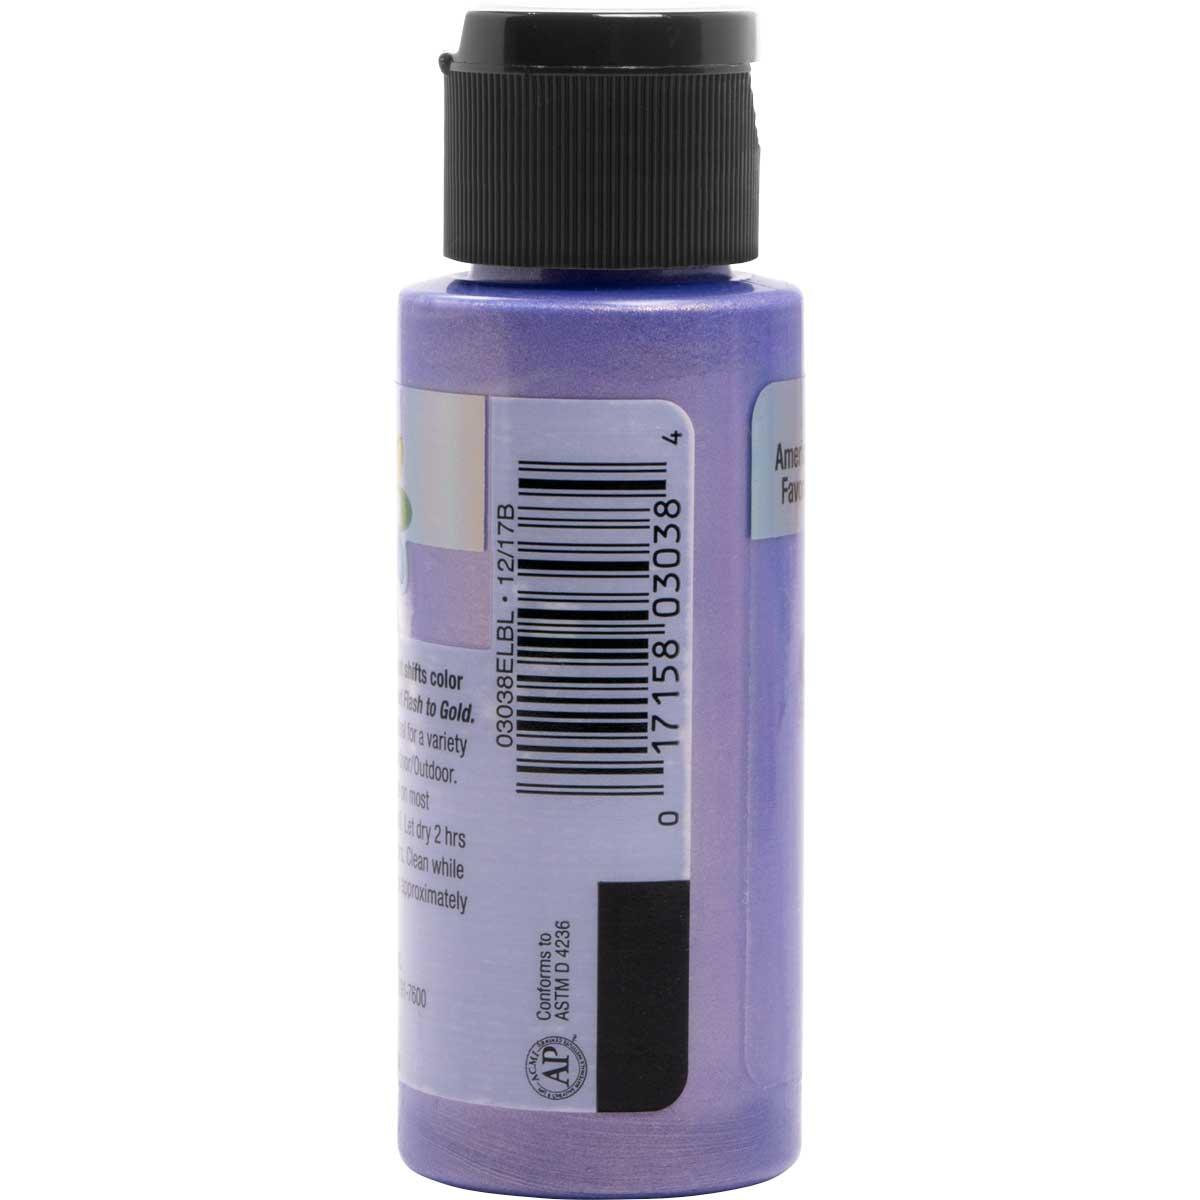 Delta Ceramcoat ® Acrylic Paint - Flash Metallic Blue Violet, 2 oz.